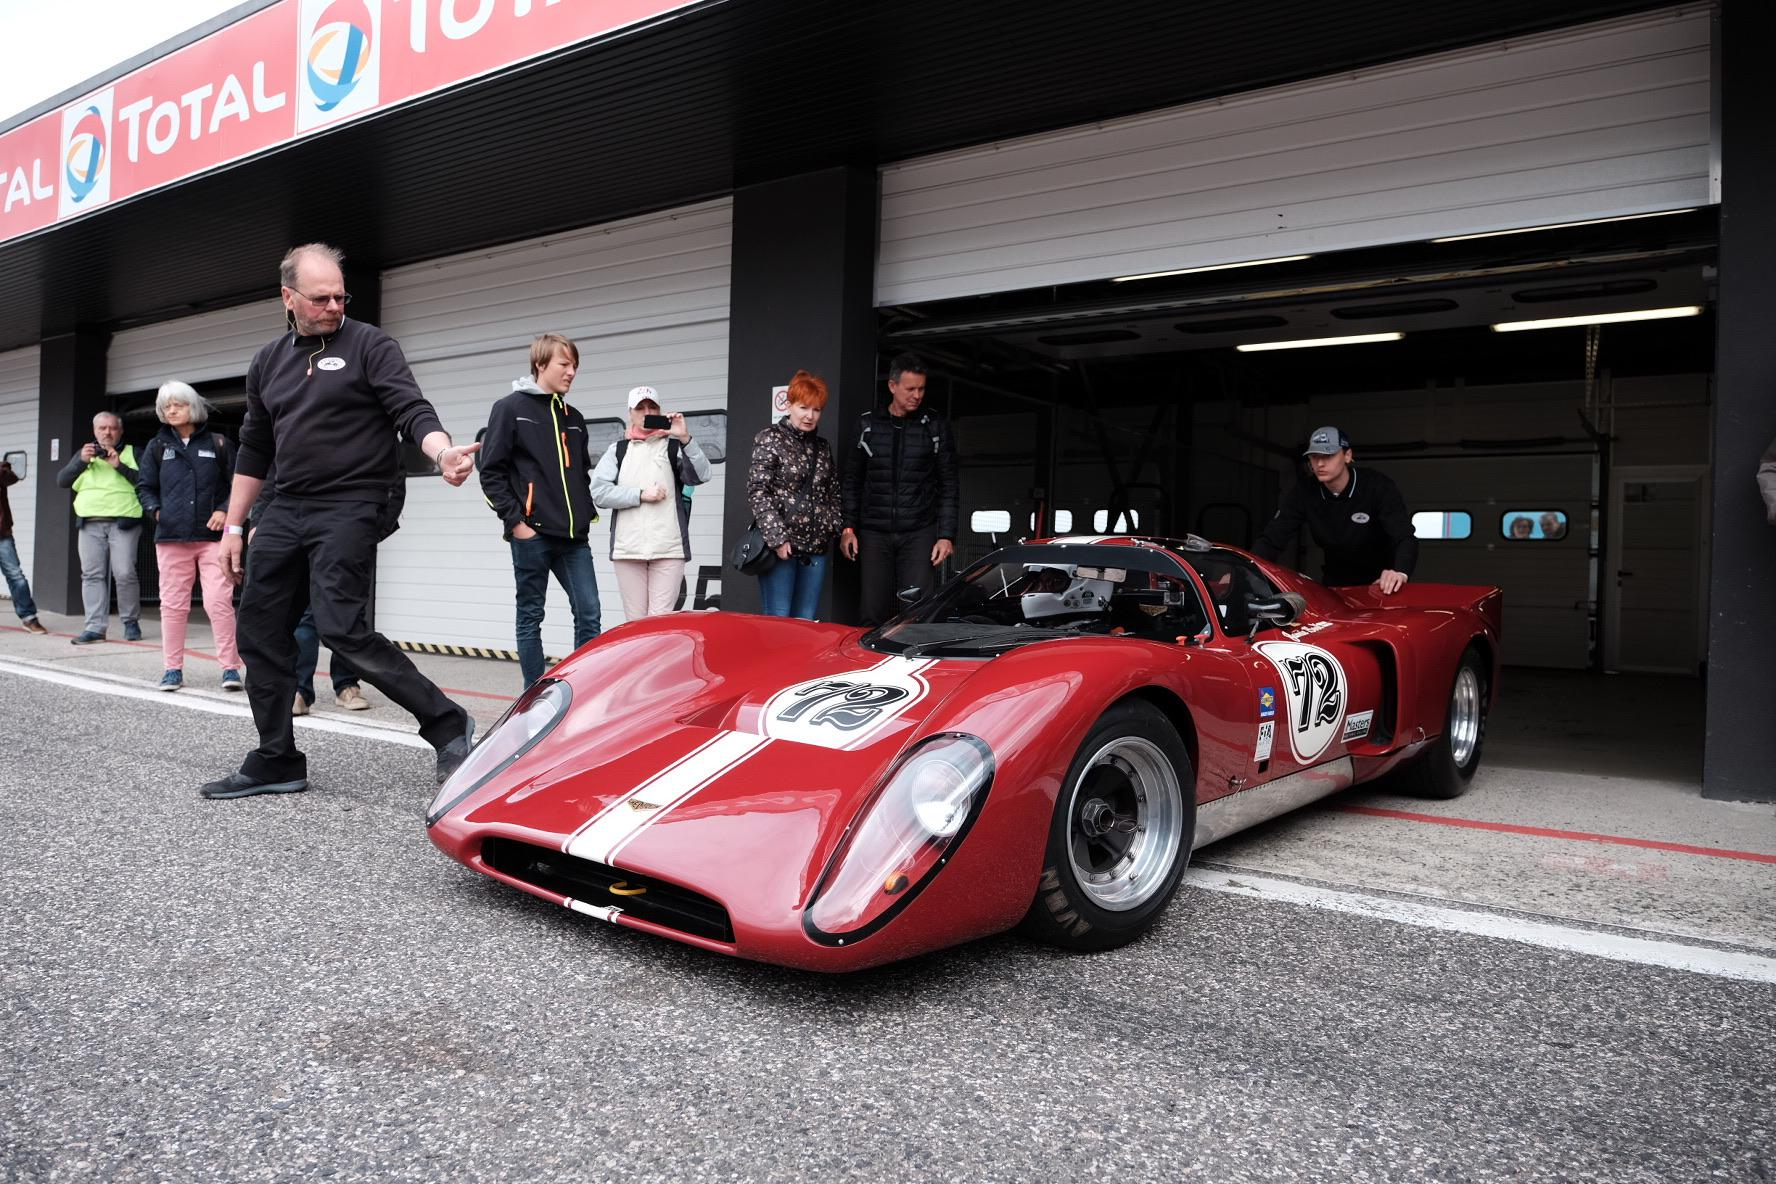 Little bit of retro racing stuff here ?